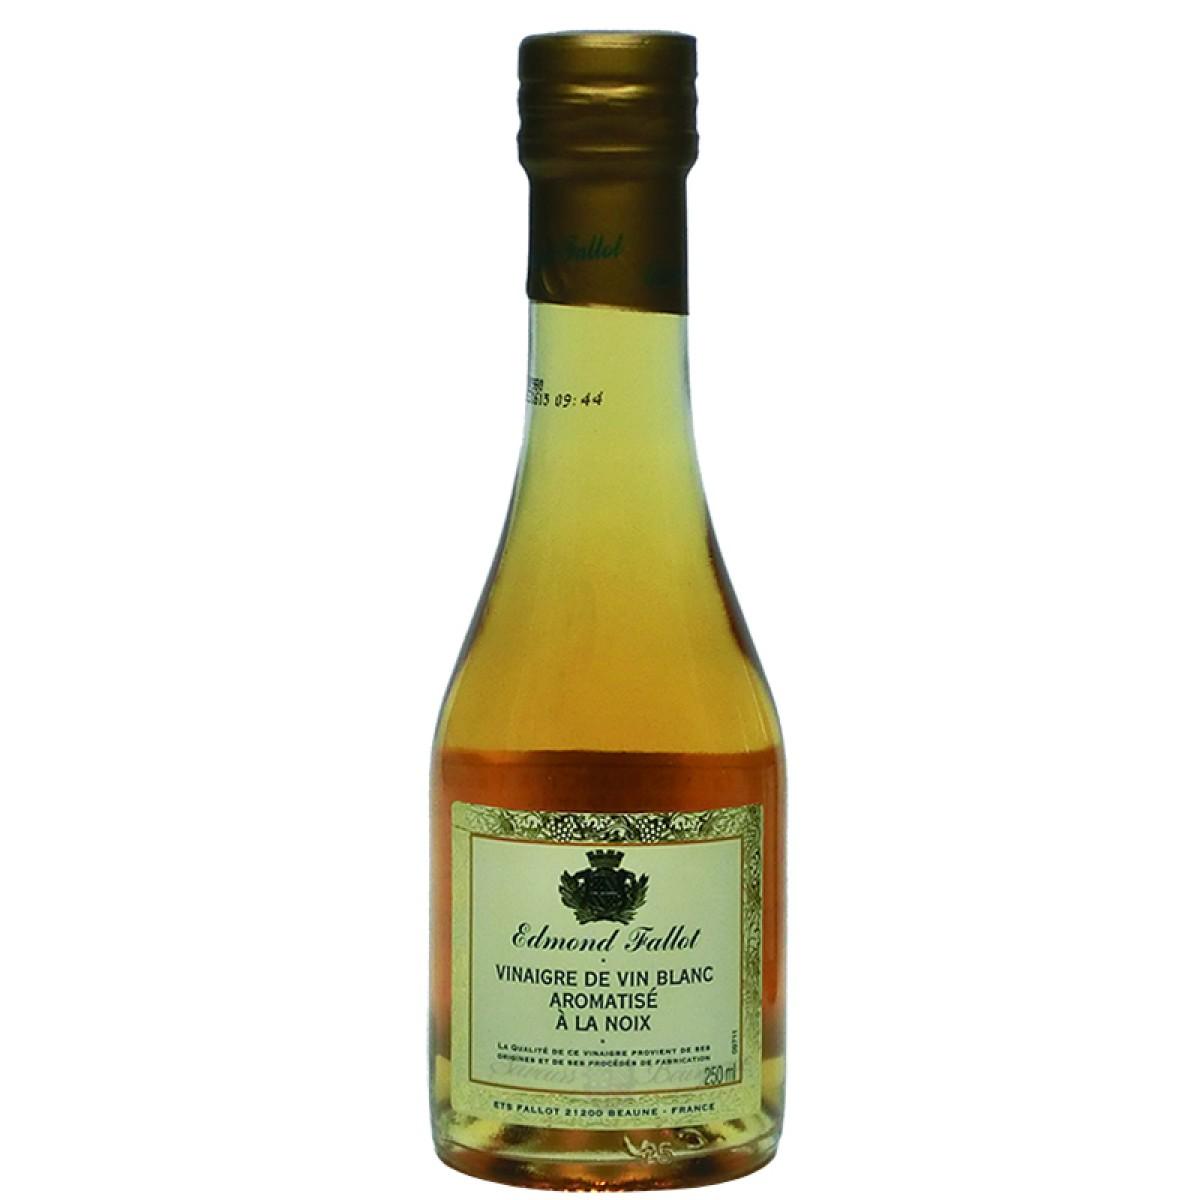 Vinaigre de vin blanc aromatis la noix 250ml fallot vinaigres sal s - Moutarde fallot vente ...